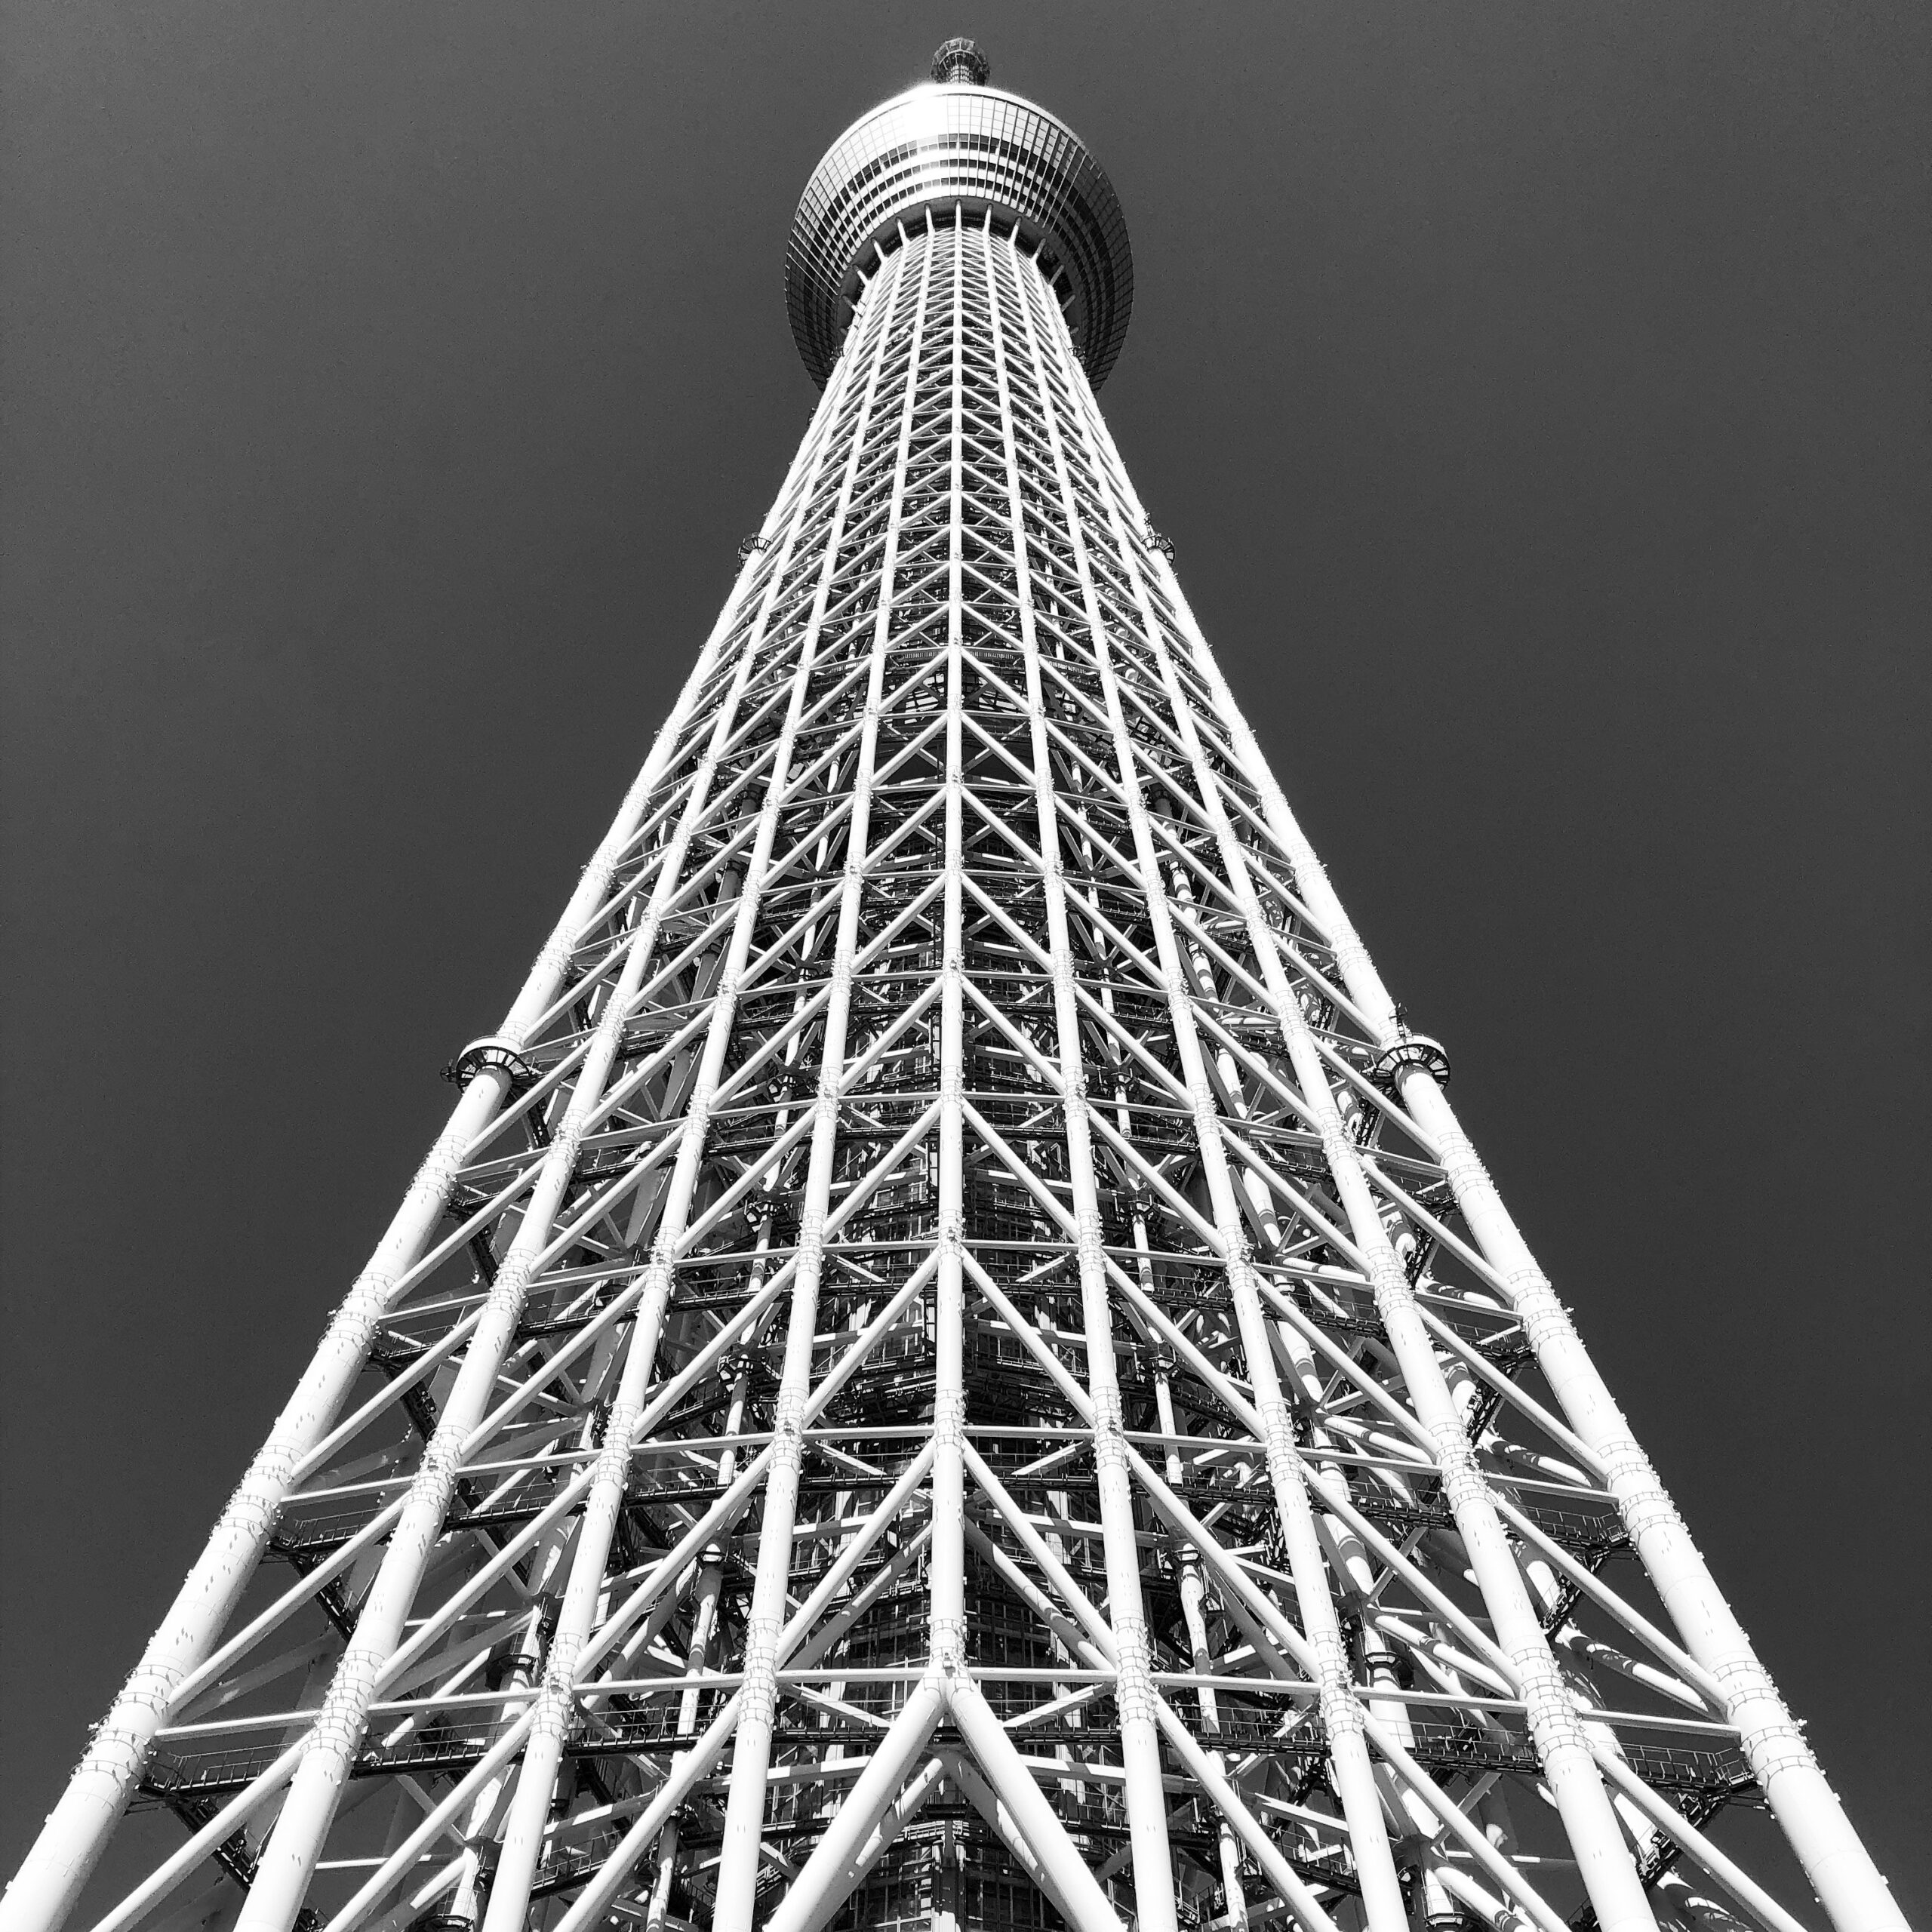 Japanese skyscraper